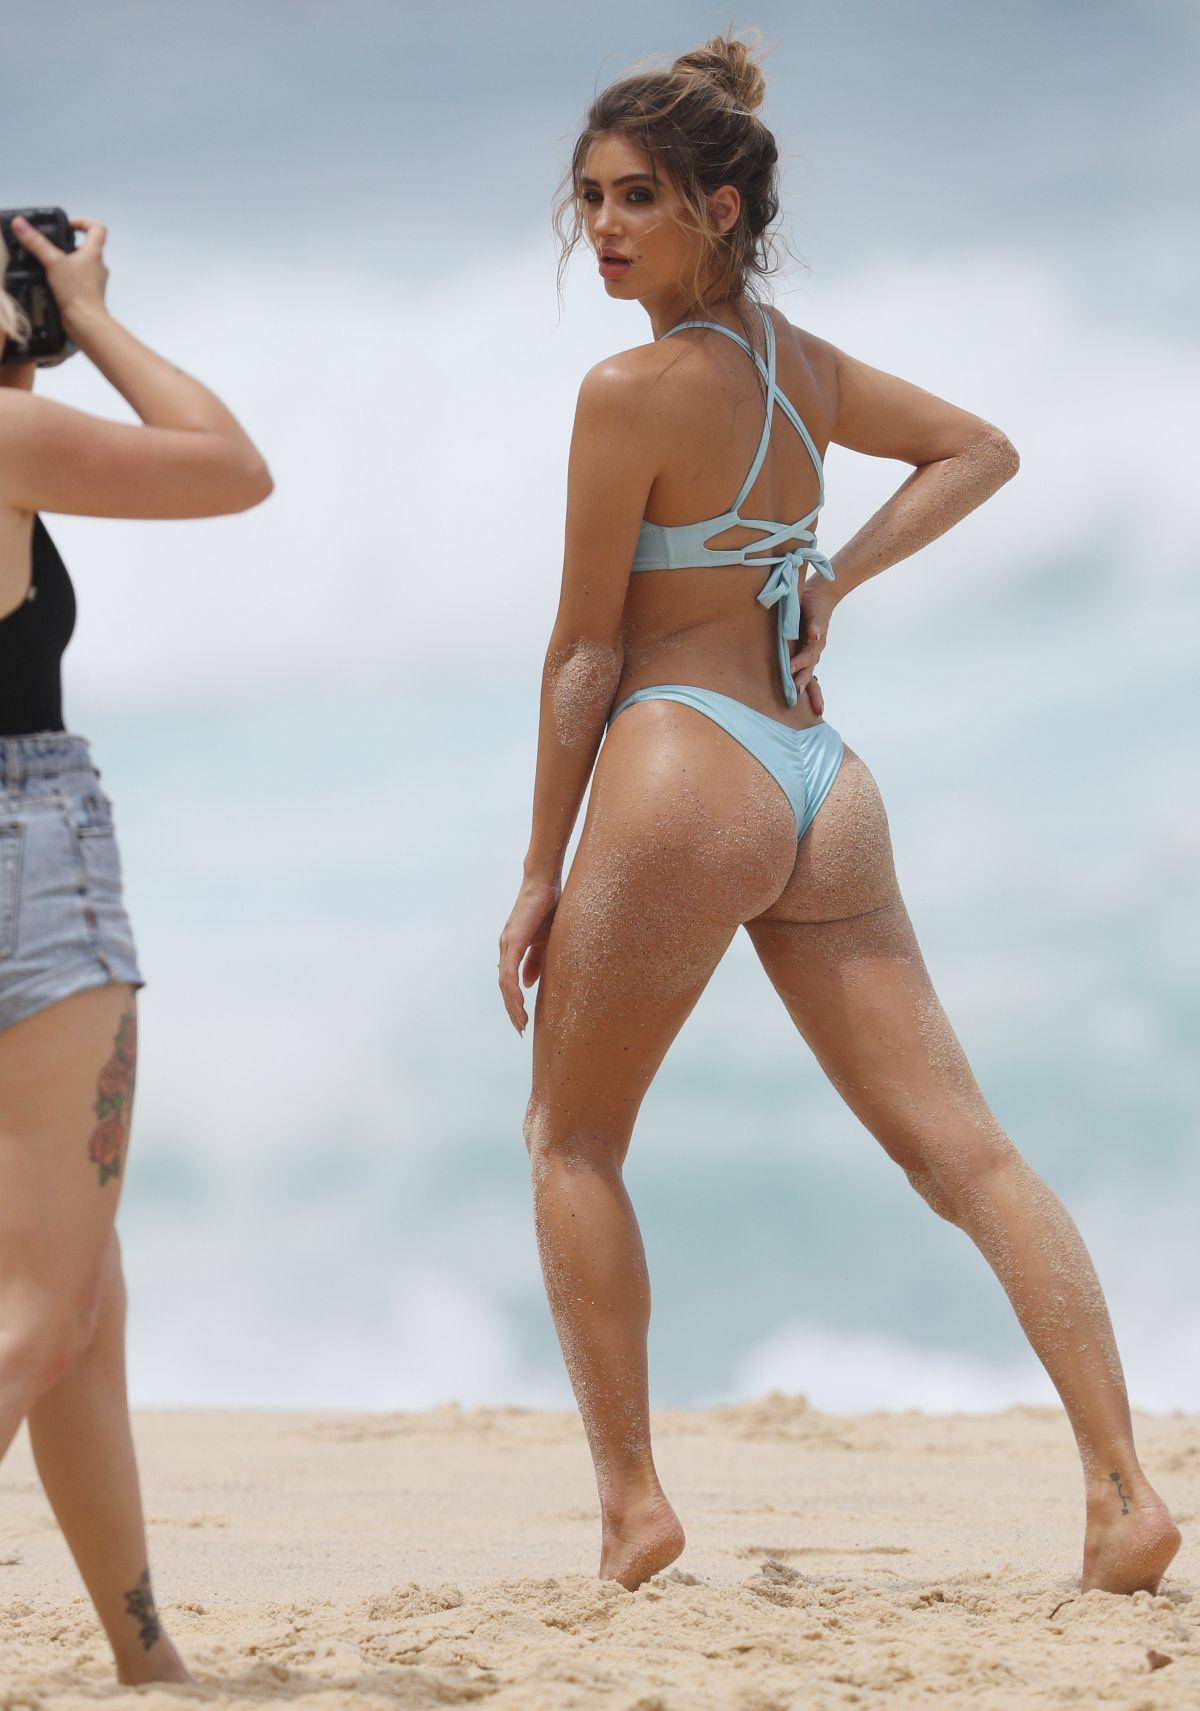 Bella Lucia Bikini Photoshoot on Bronte Beach Pic 12 of 35